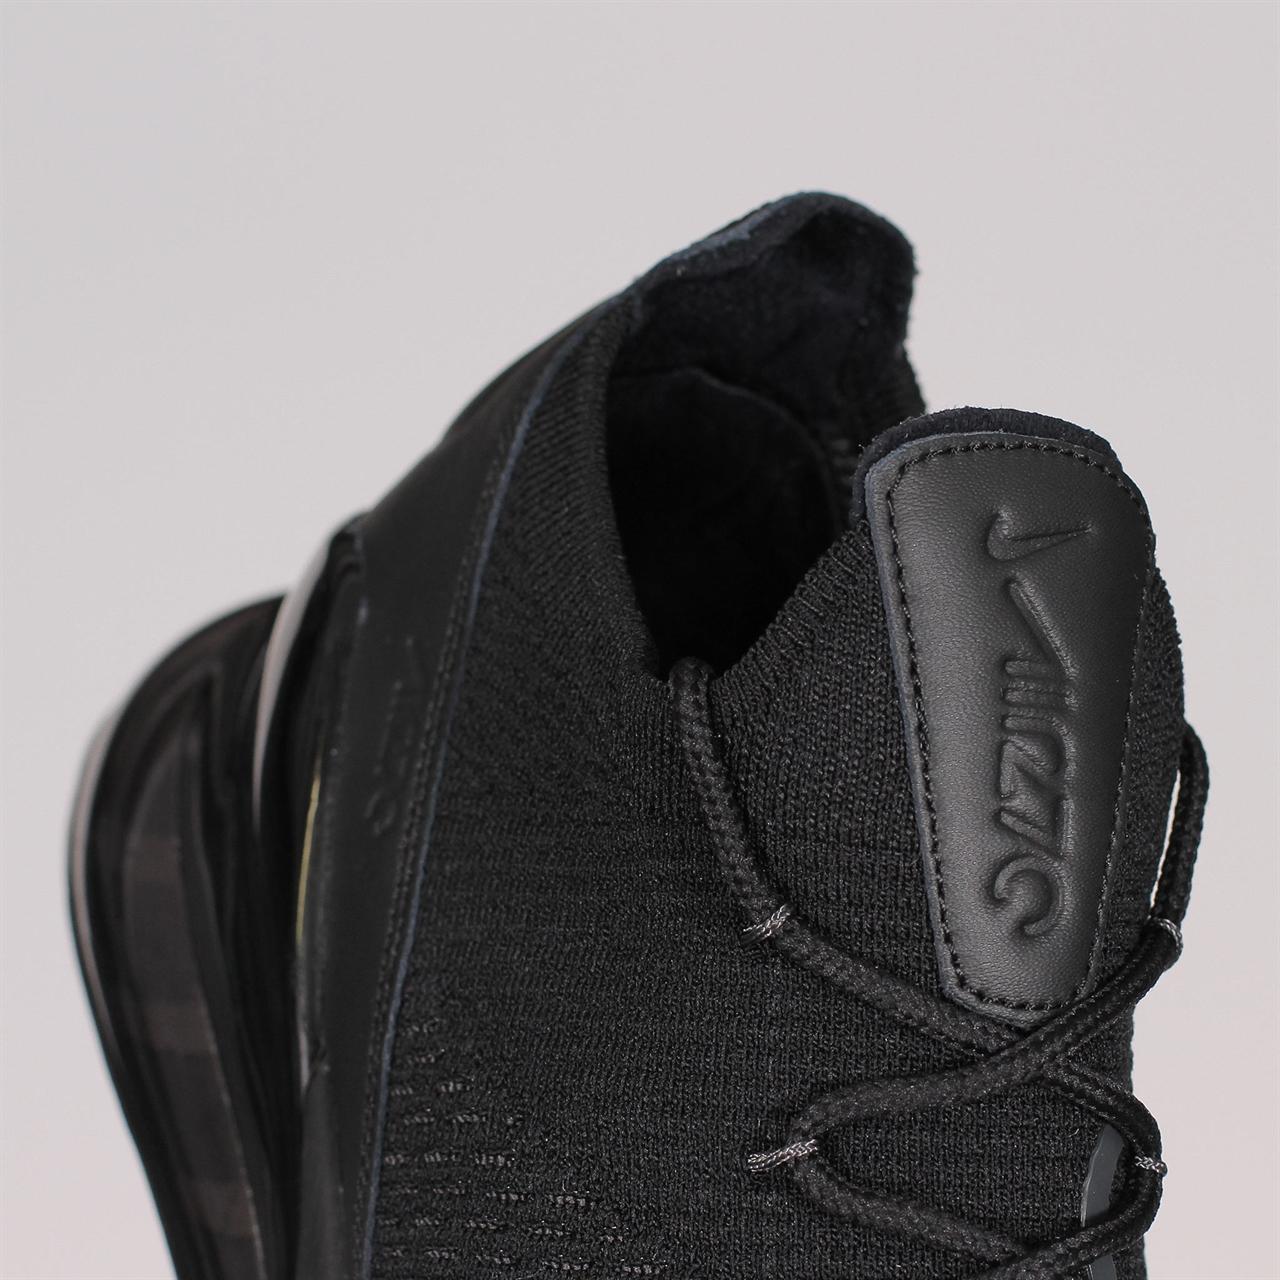 super popular 80ae6 8a53d Nike SportswearNike Sportswear Air Max 270 Flyknit (AO1023-005). 1